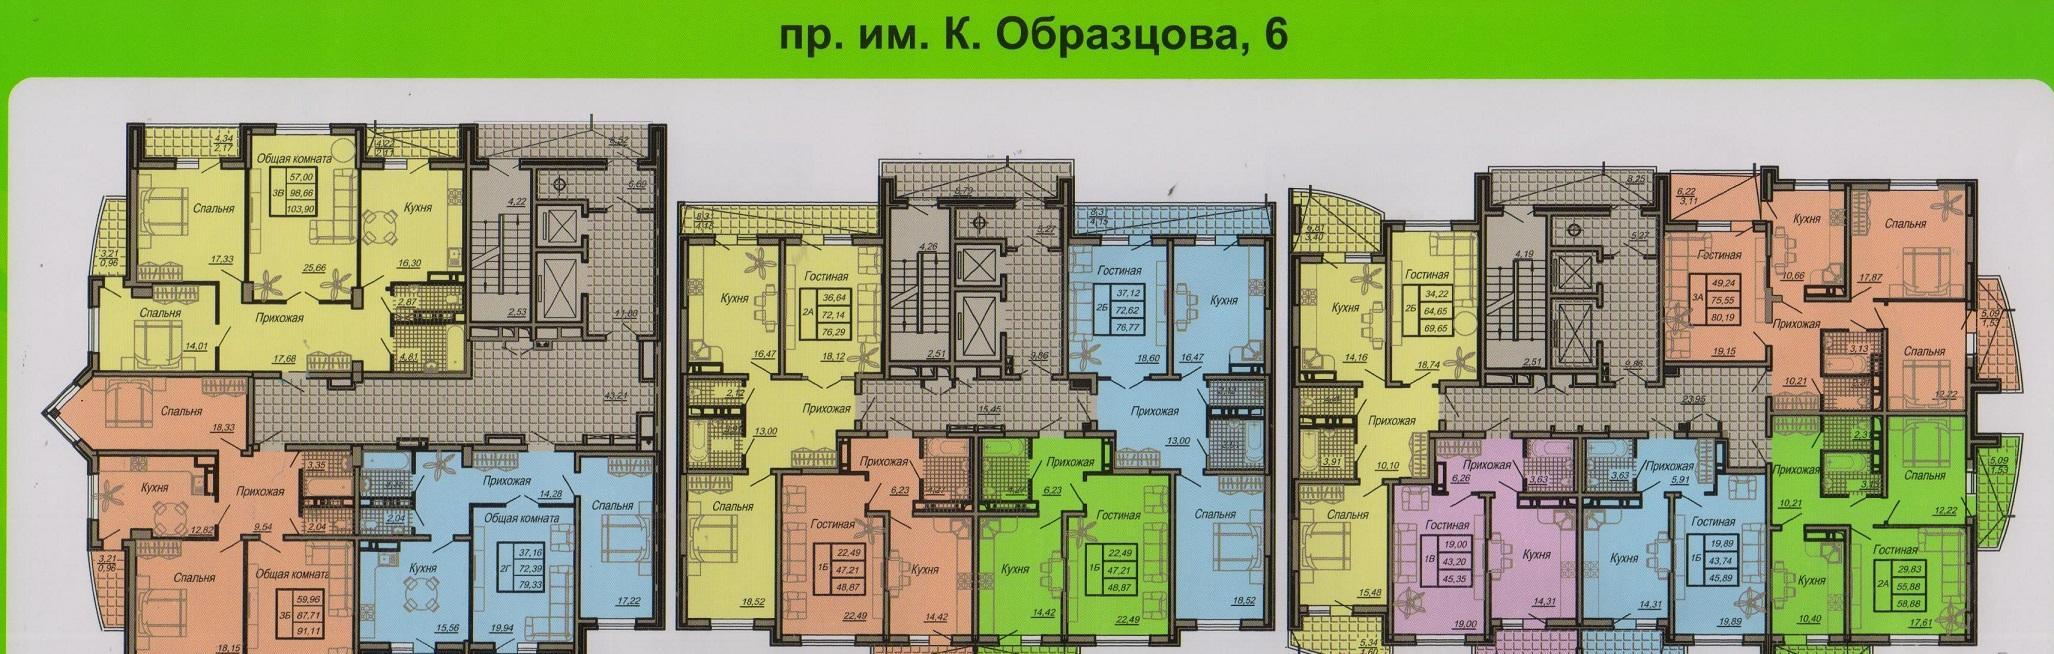 Планировки ЖК пр. им. К.Образцова, 6 Краснодар | план - 1